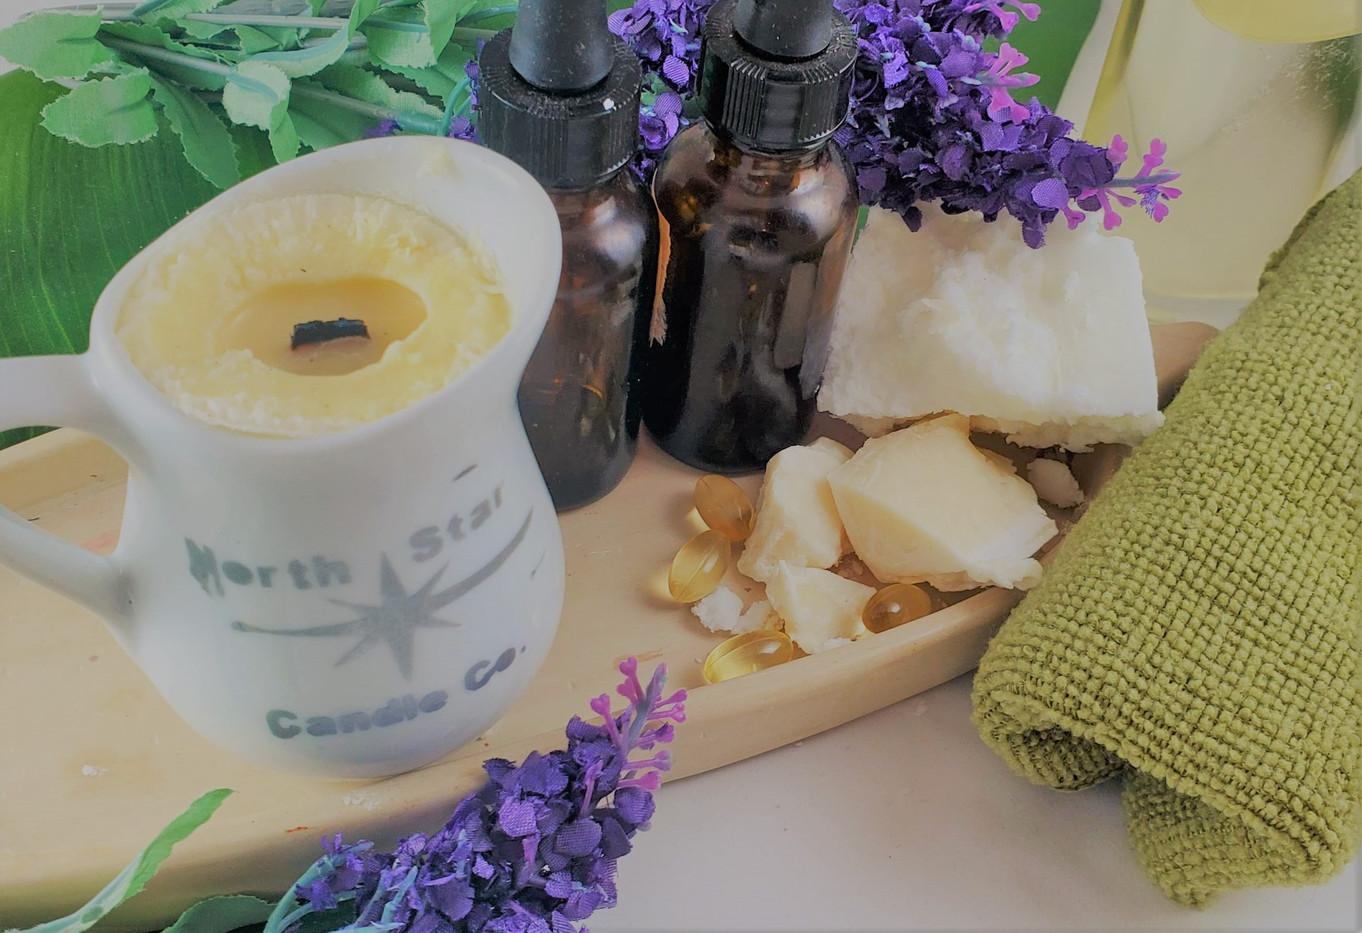 4 oz Massage Oil Candle